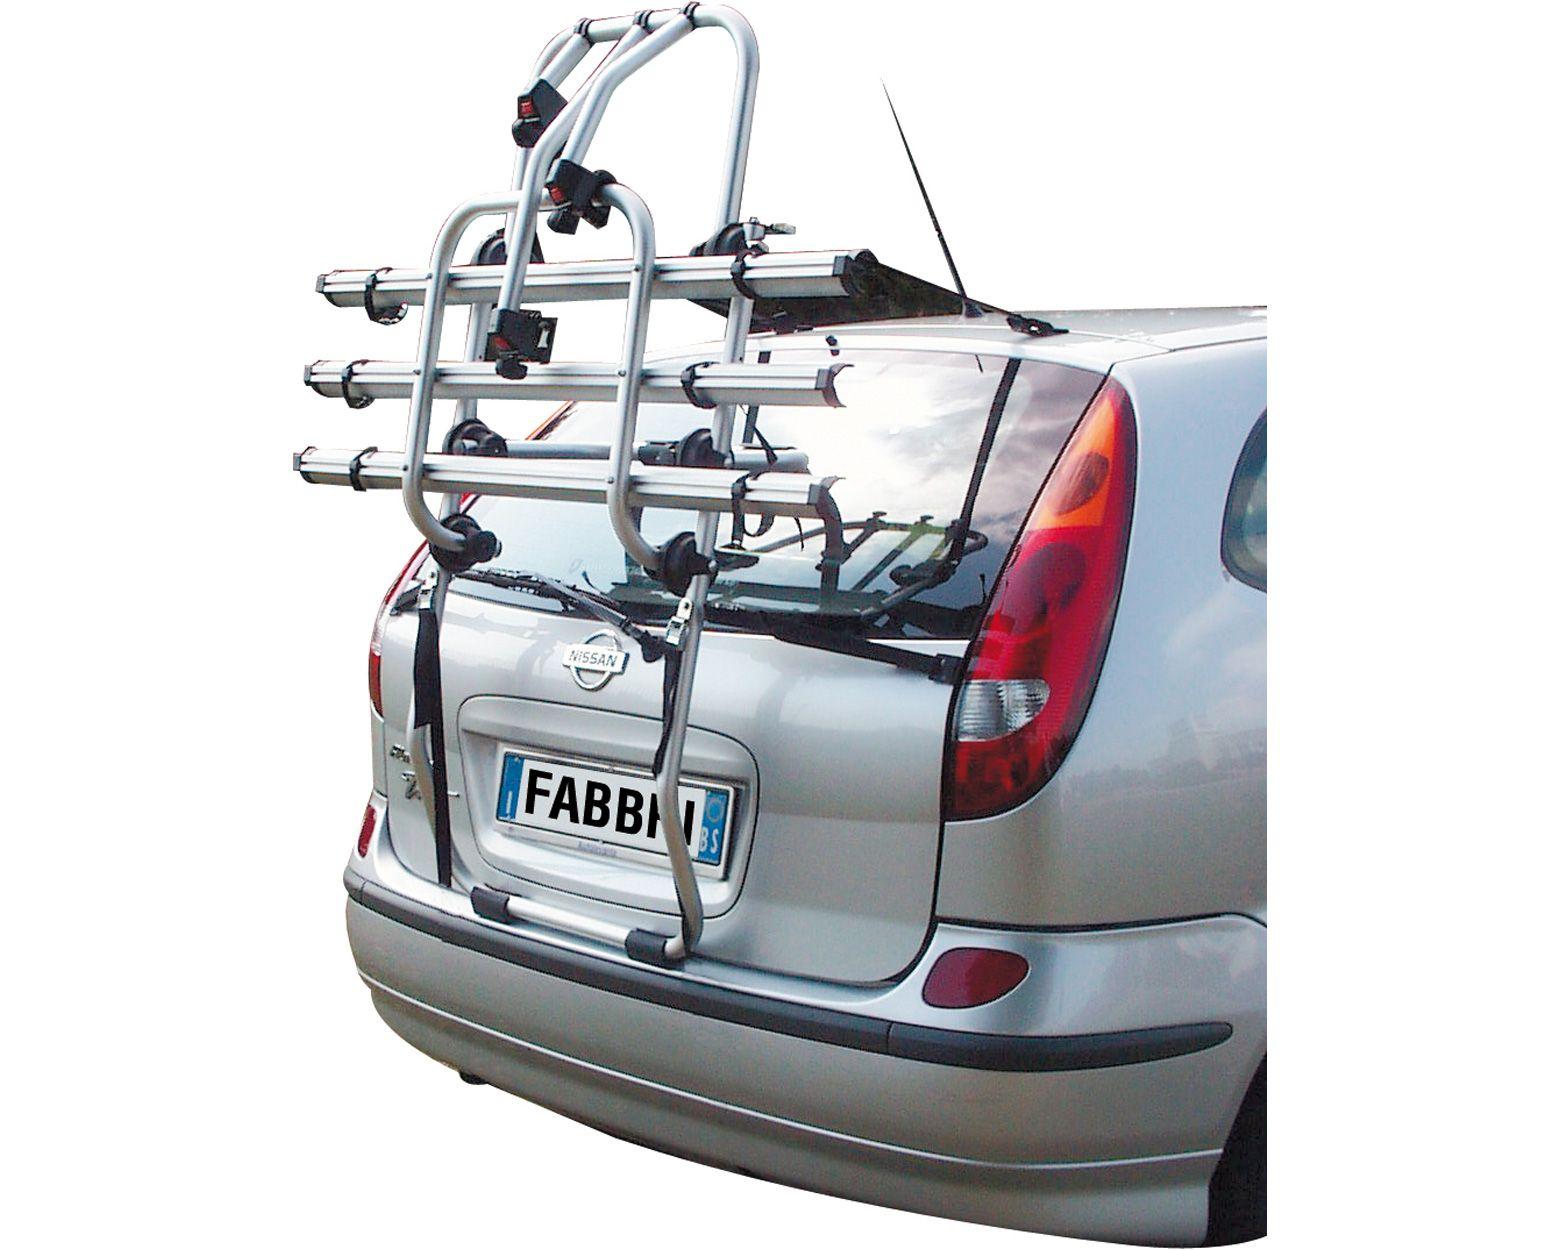 BICI OK 2 Van Rear bike rack to transport 2 bikes For